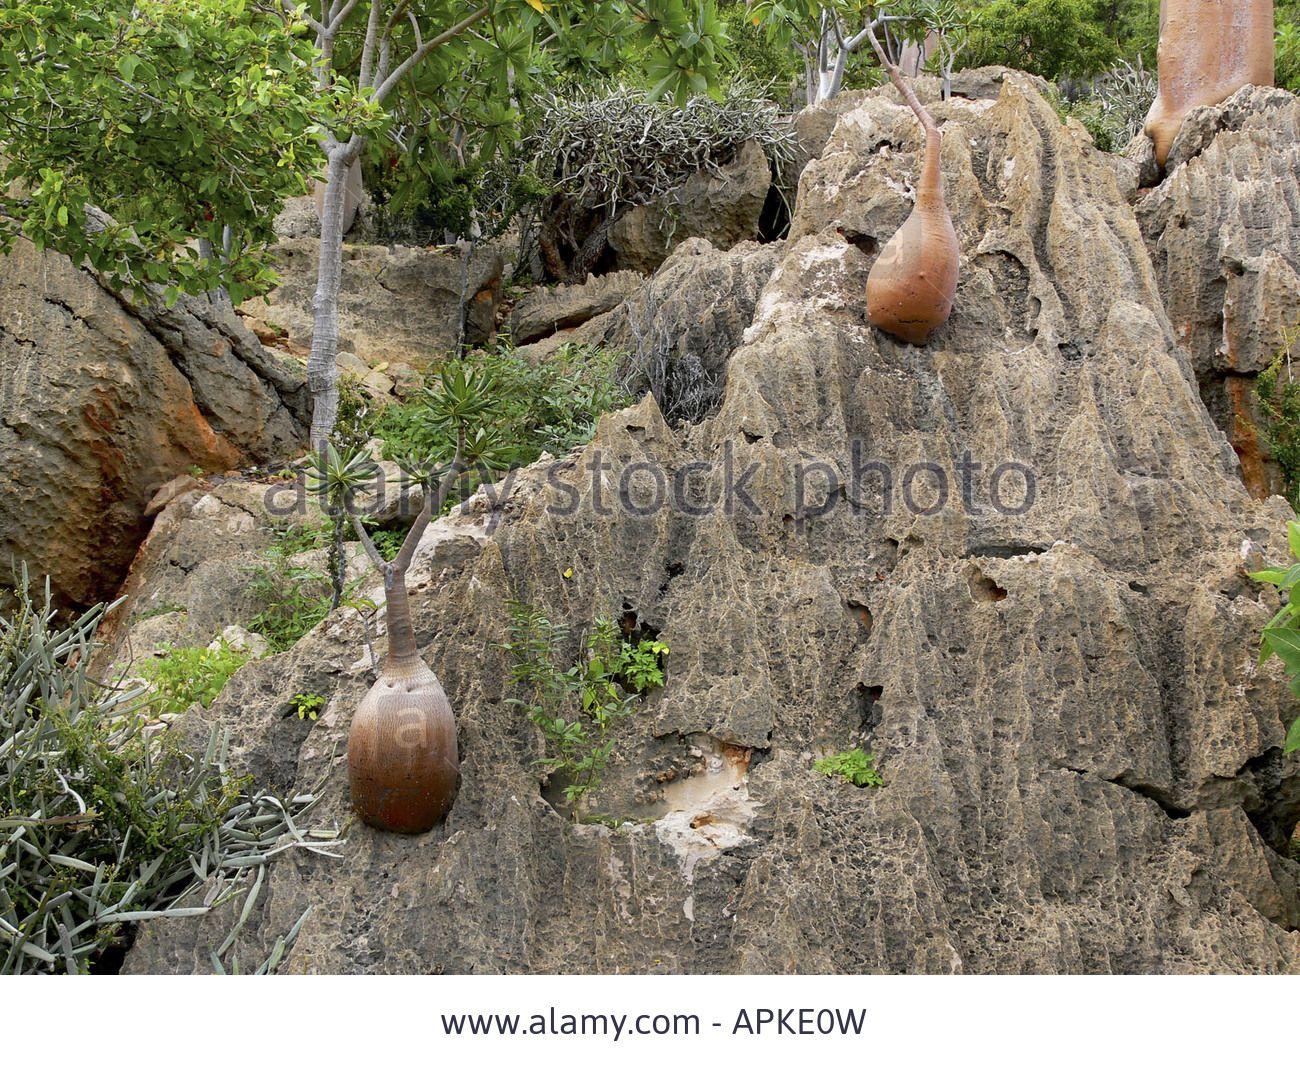 Image from http://c8.alamy.com/comp/APKE0W/desert-rose-adenium-obesum-ssp-socotranum-numerous-plants-in-their-APKE0W.jpg.